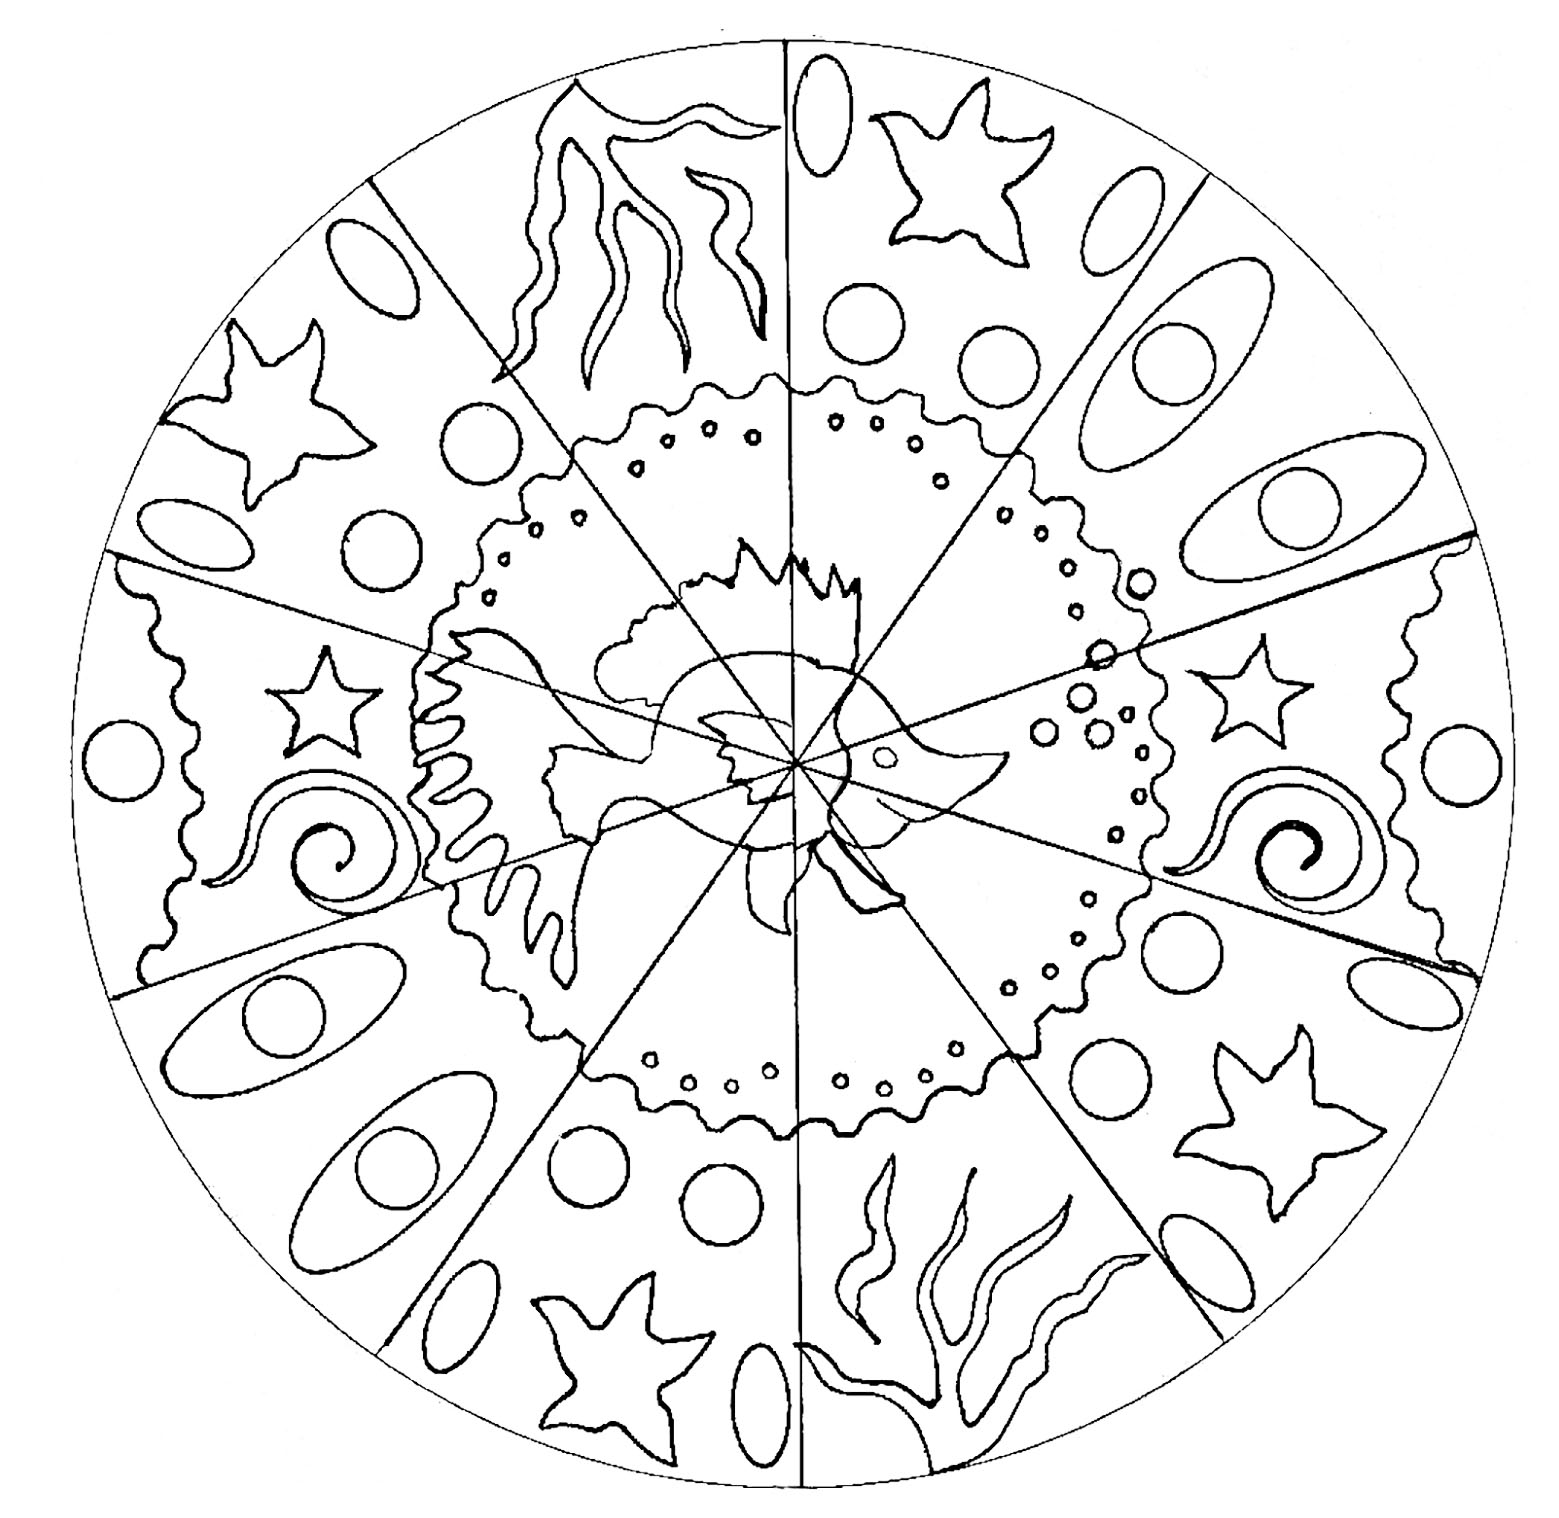 Fish Mandala Mandalas Coloring Pages For Adults Justcolor